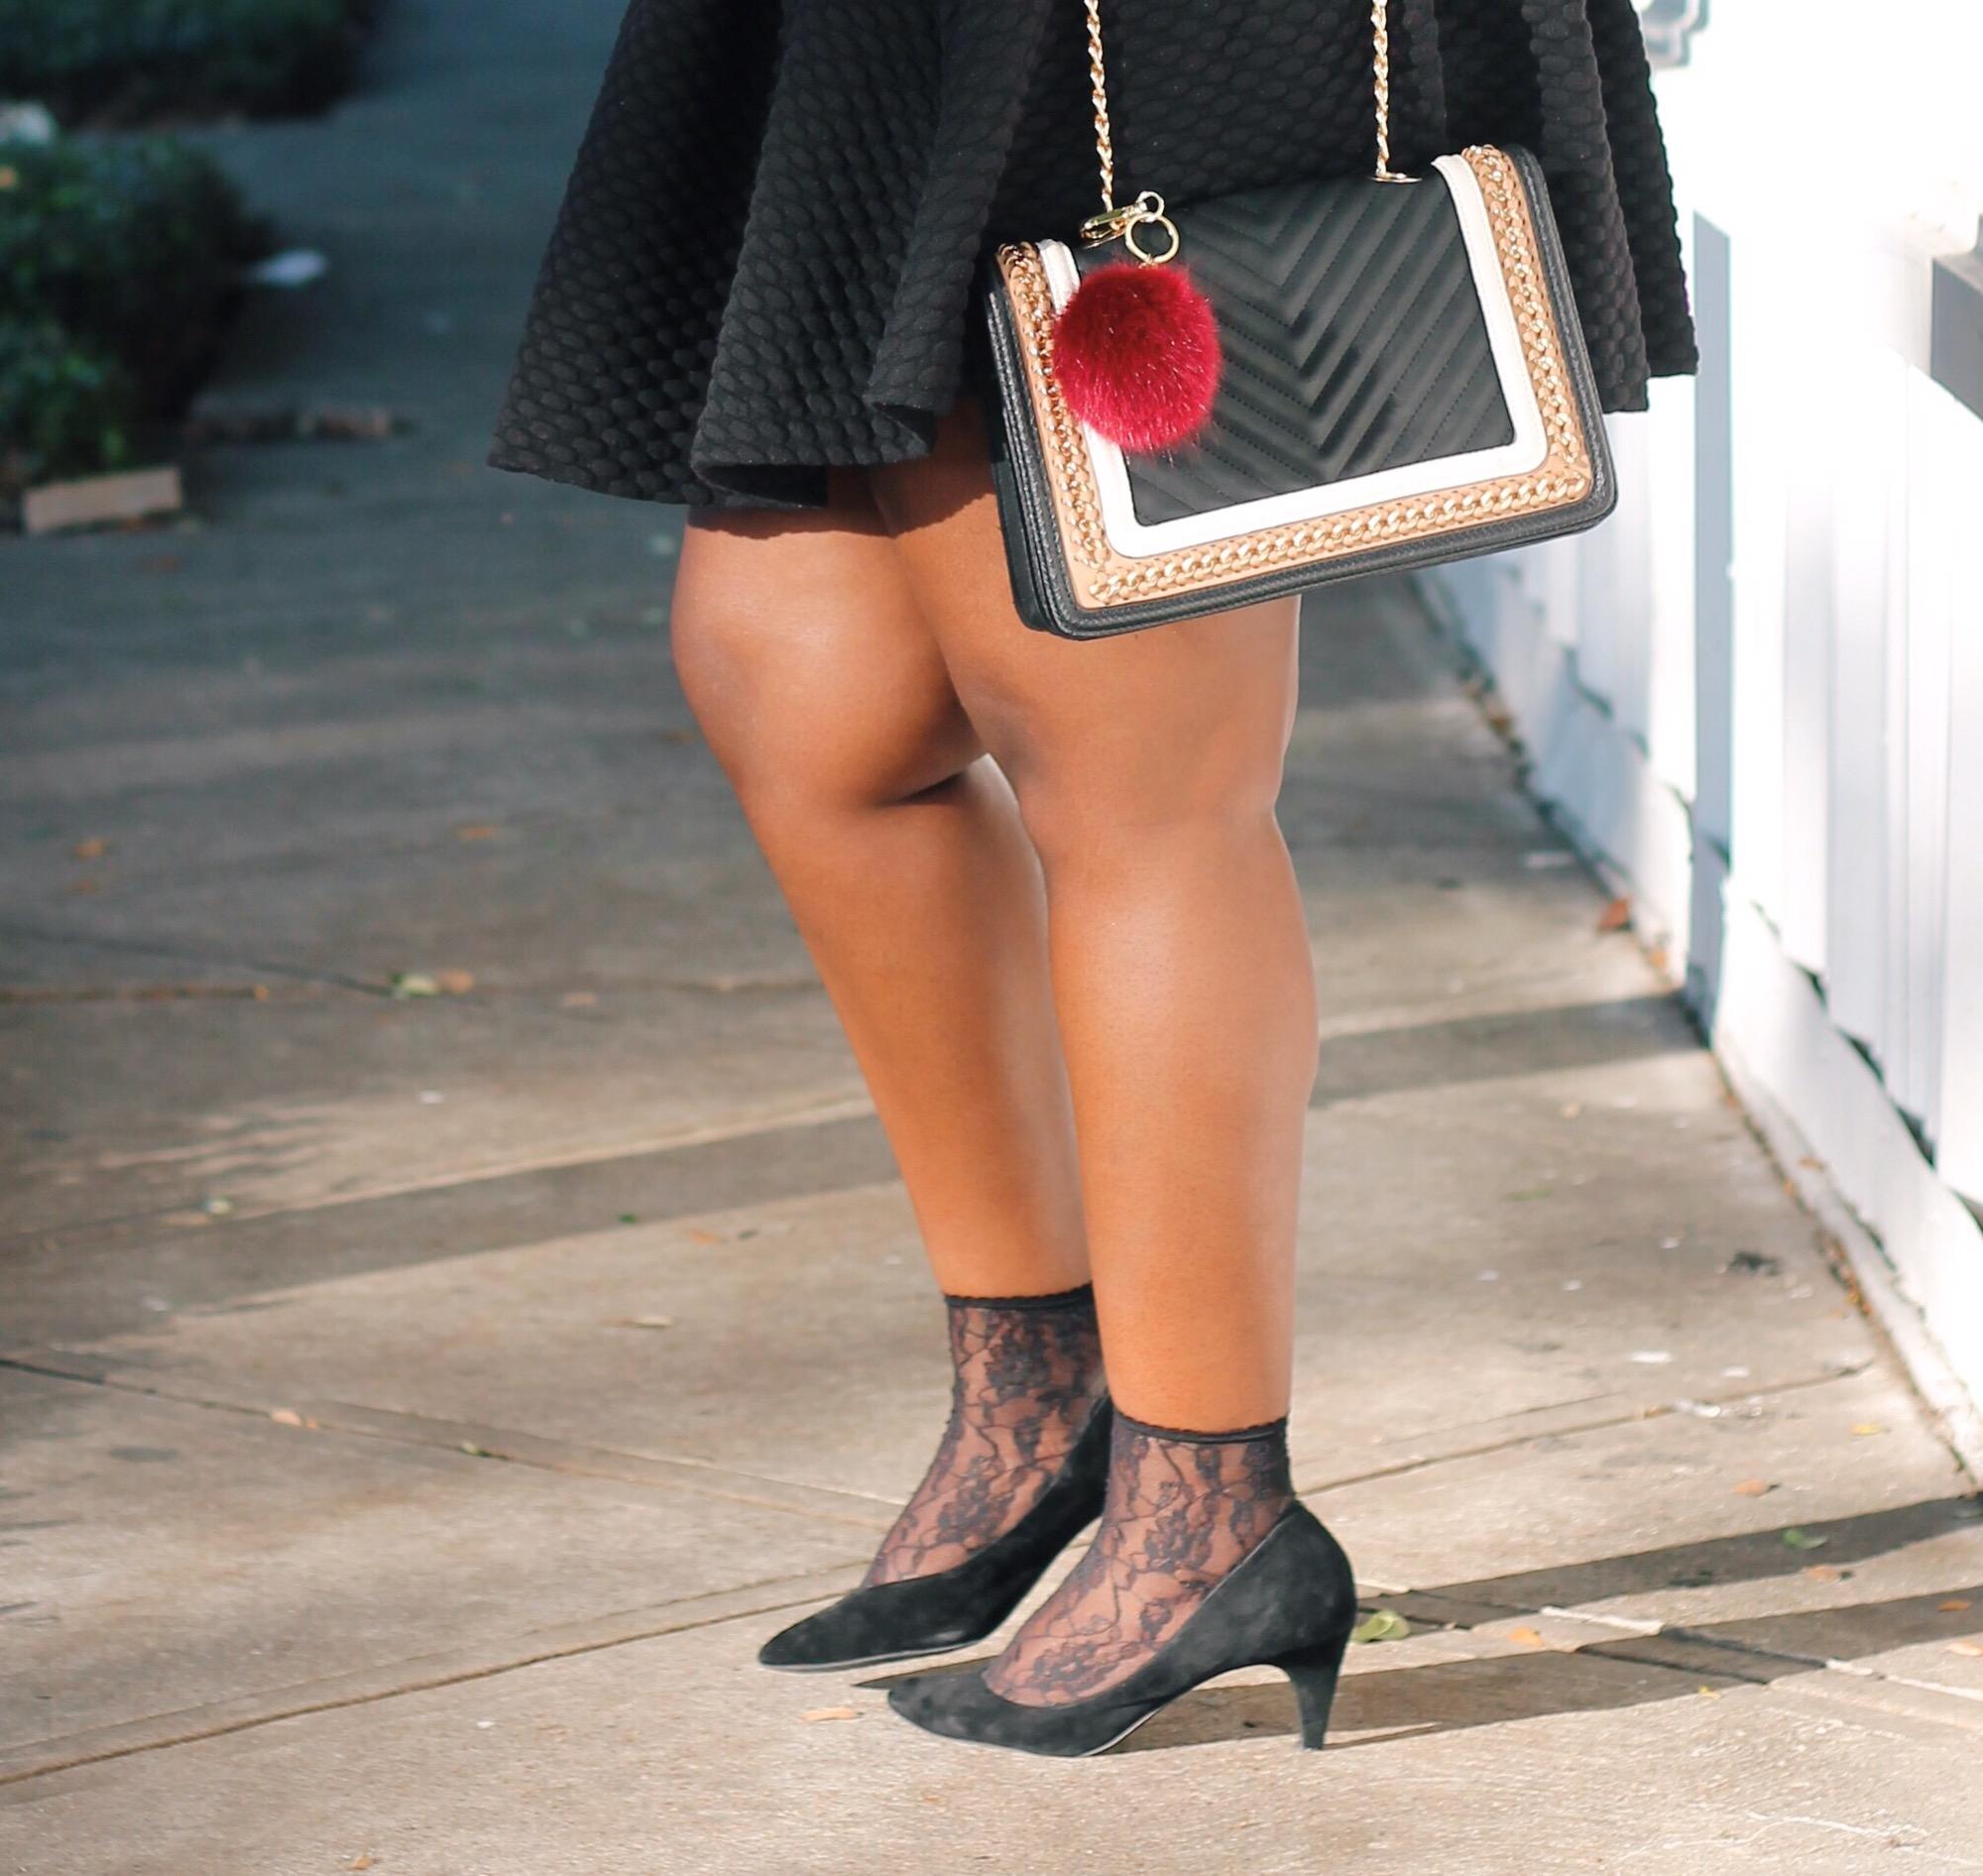 plus size black bloggers, clothes for curvy girls, curvy girl fashion clothing, plus blog, plus size fashion tips, plus size women blog, at fashion blog, plus size high fashion, curvy women fashion, plus blog, curvy girl fashion blog, style plus curves, plus size fashion instagram, curvy girl blog, bbw blog, plus size street fashion, plus size beauty blog, plus size fashion ideas, curvy girl summer outfits, plus size fashion magazine, plus fashion bloggers,